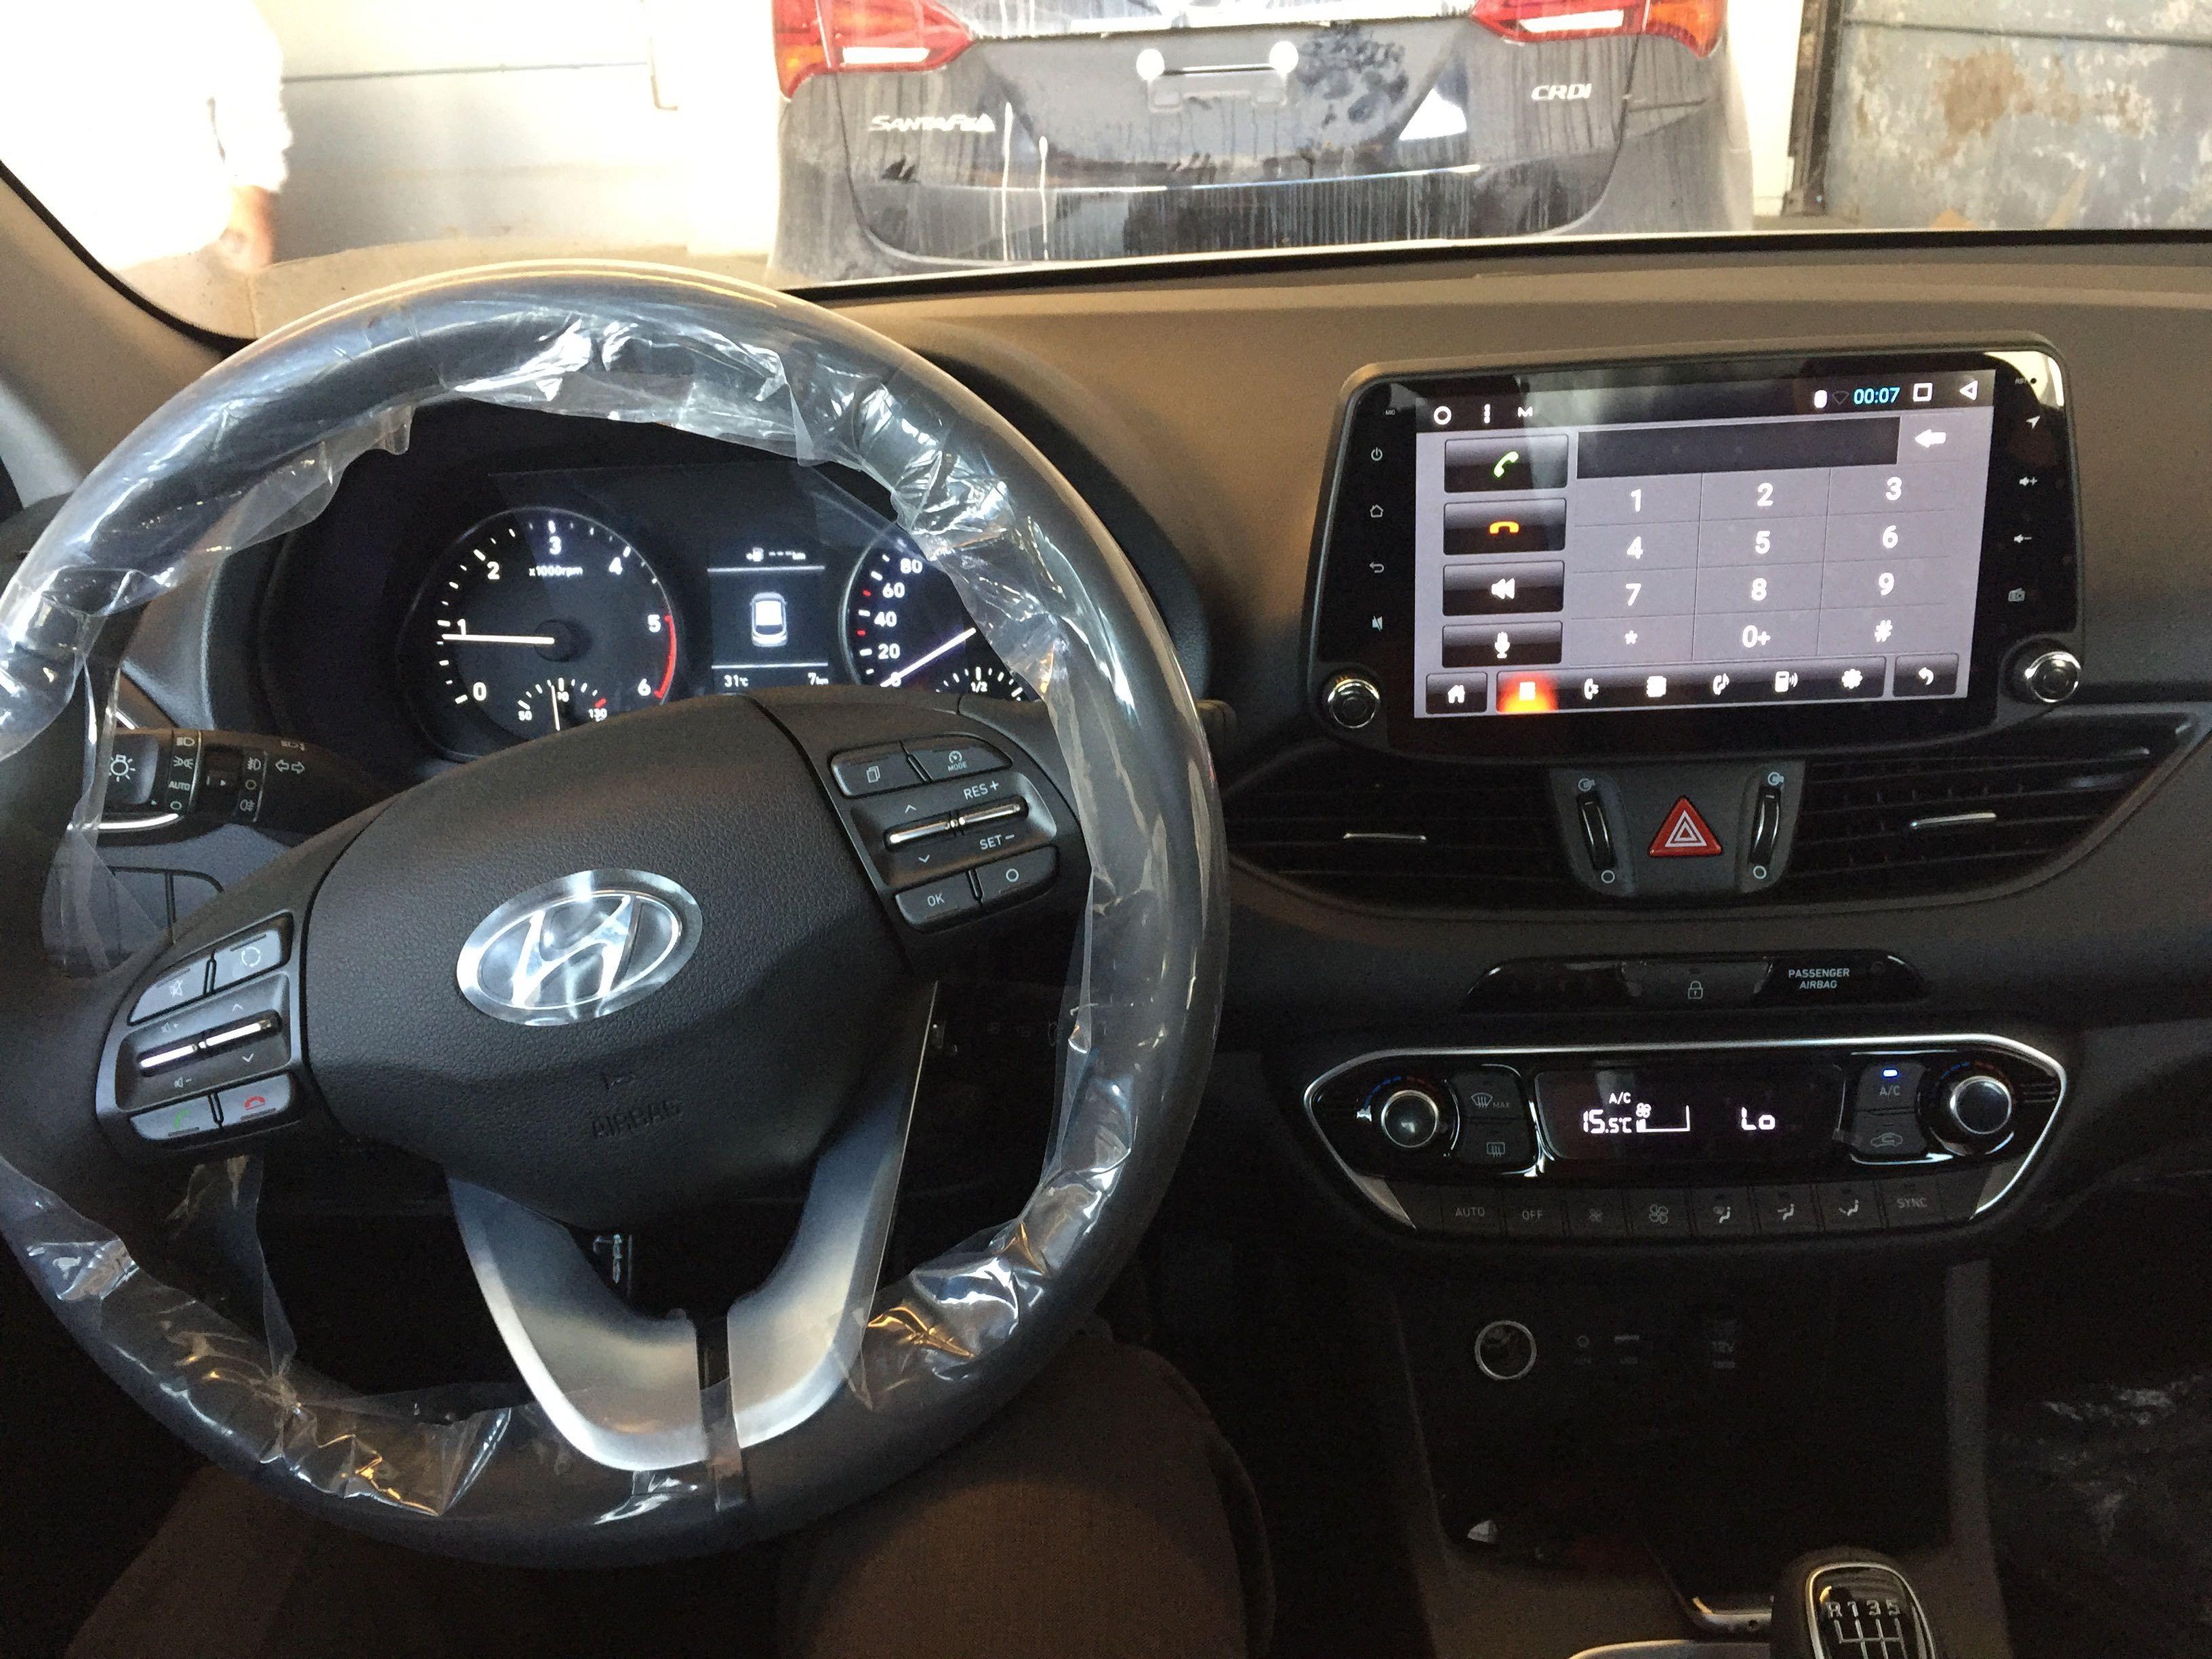 hyundai i30 2017 car audio video infotainment system. Black Bedroom Furniture Sets. Home Design Ideas